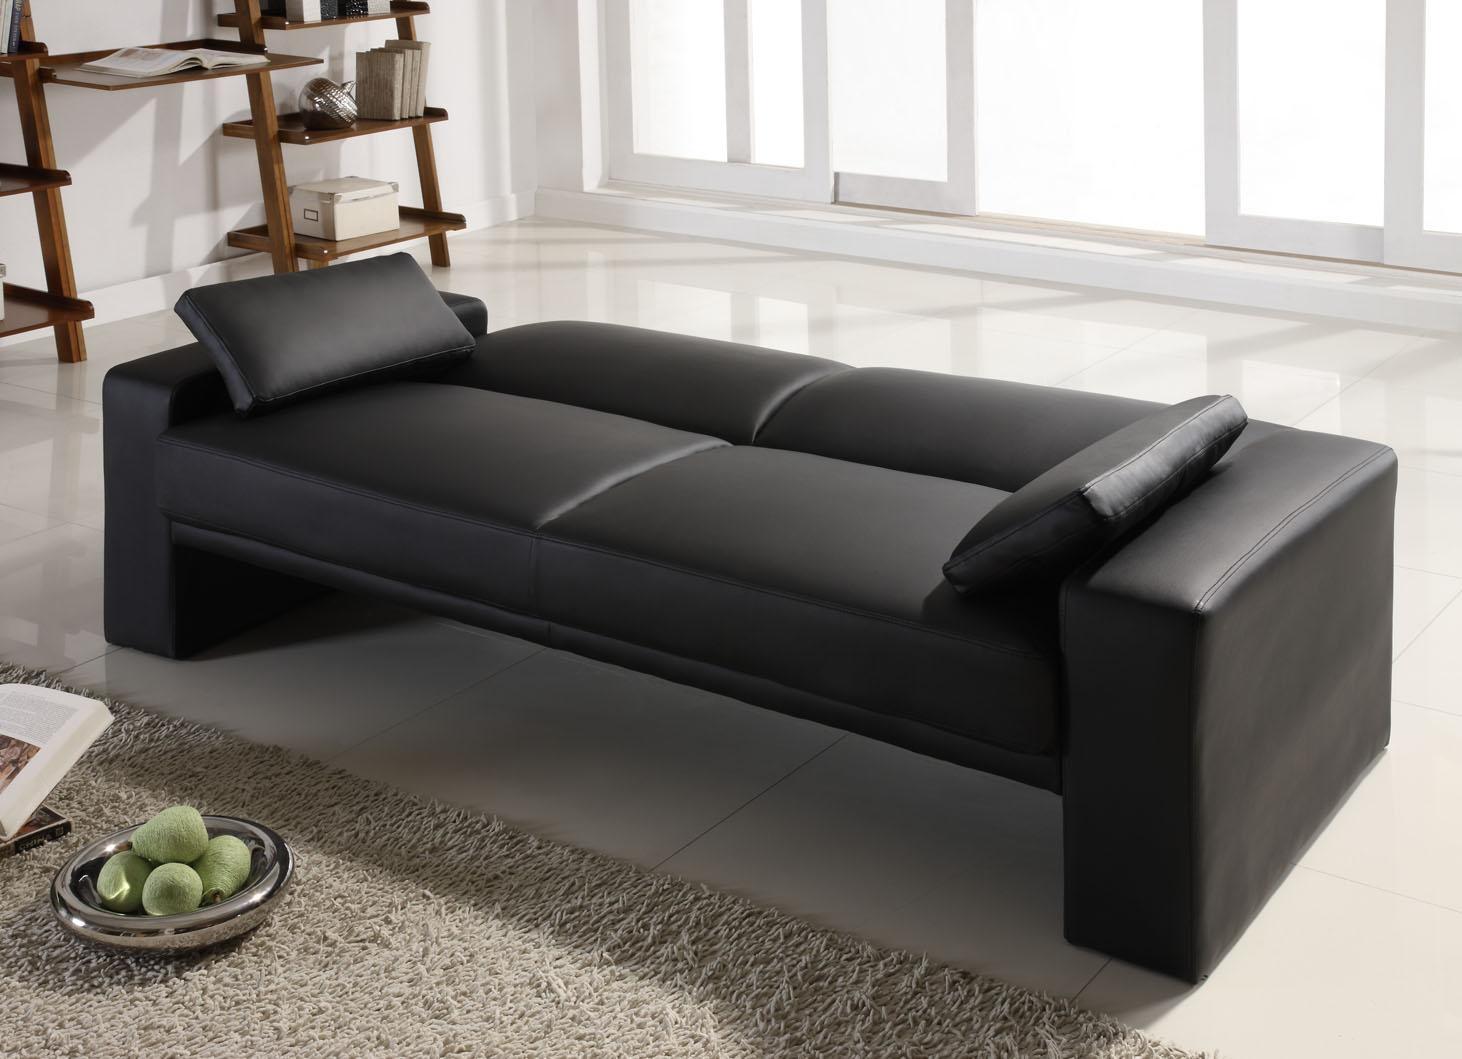 Sofas Center : Bycast Leather Futon Sofa Emily Faux Convertible Throughout Faux Leather Futon Sofas (View 2 of 20)